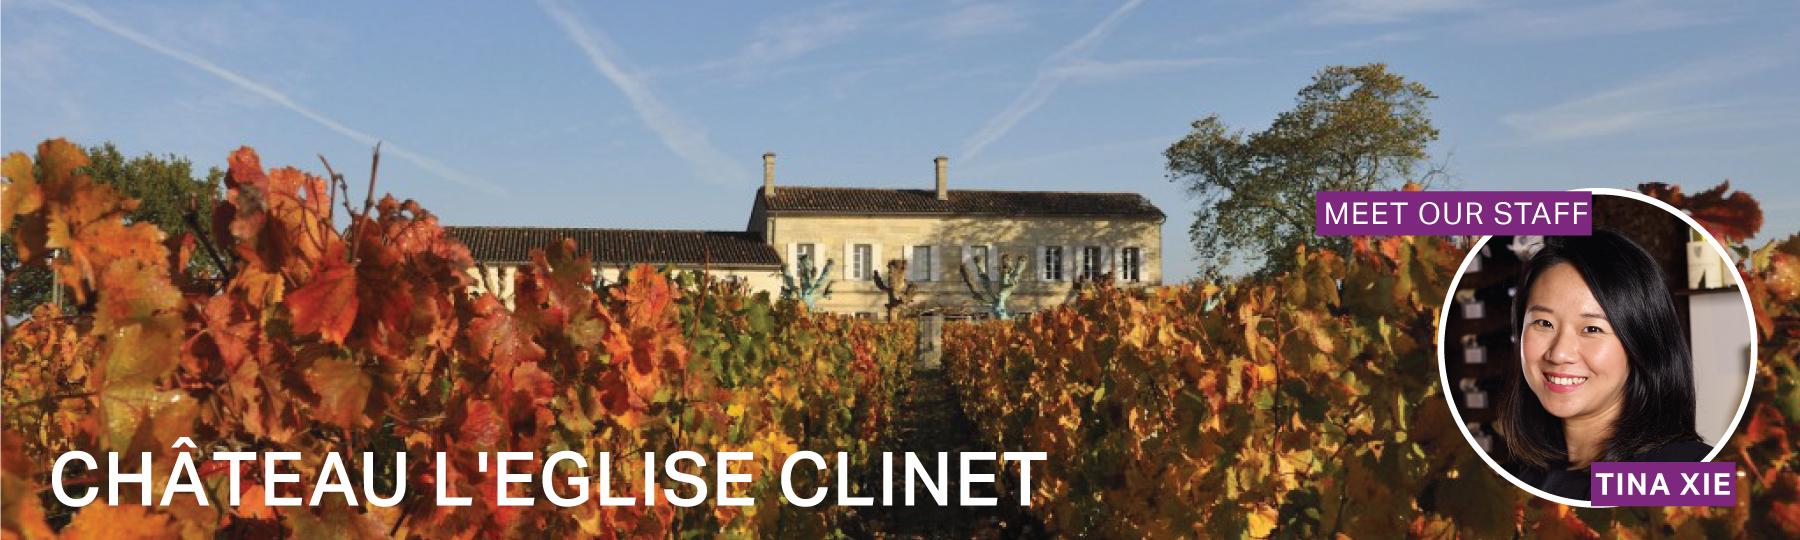 Fine Wine Friday: Château l'Eglise Clinet